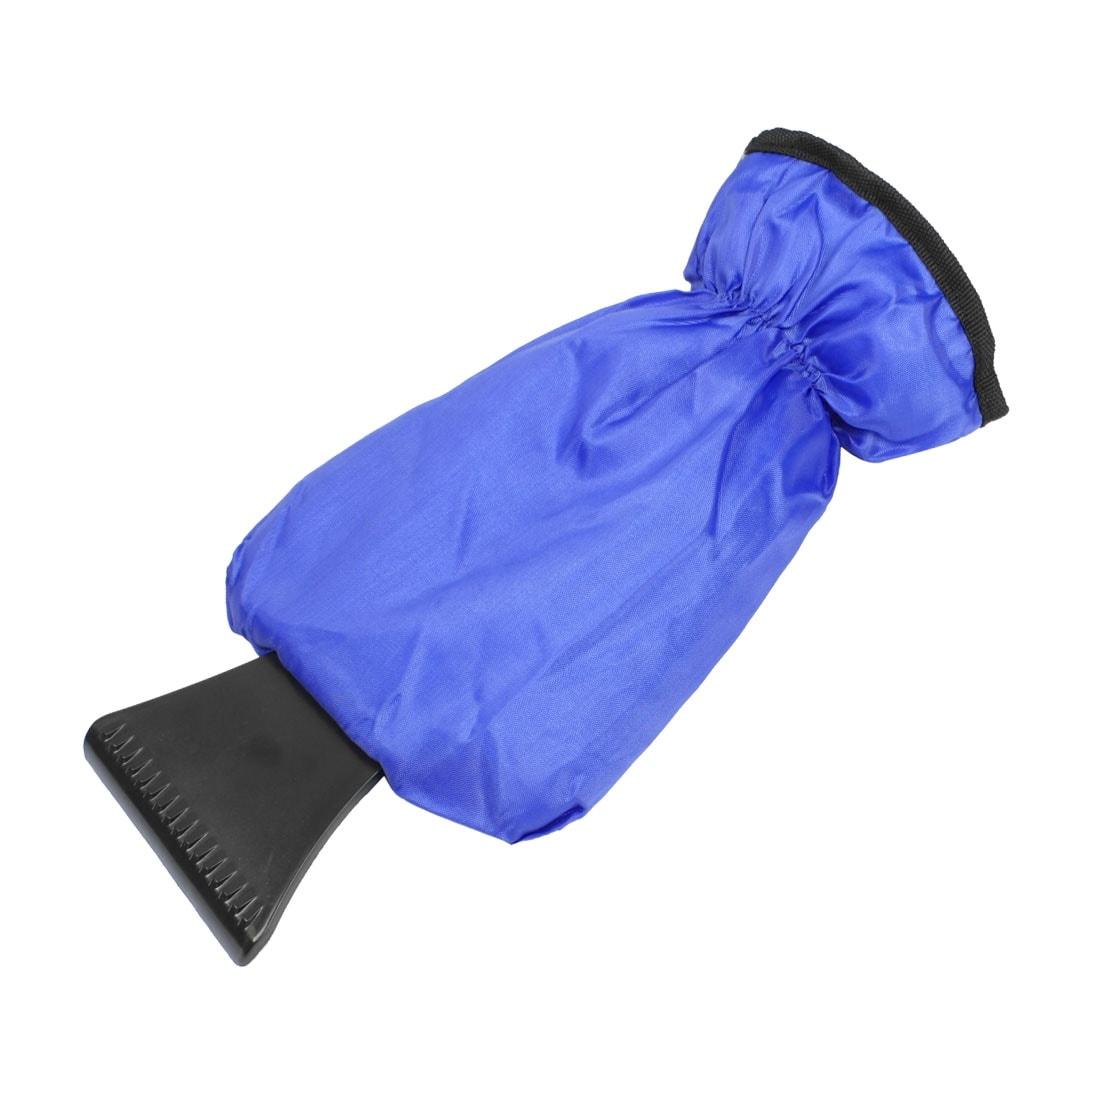 Unique Bargains Car Snow Shovel Ice Handle Emergency Scraper Cleaning Tool w Fleece Lining Glove